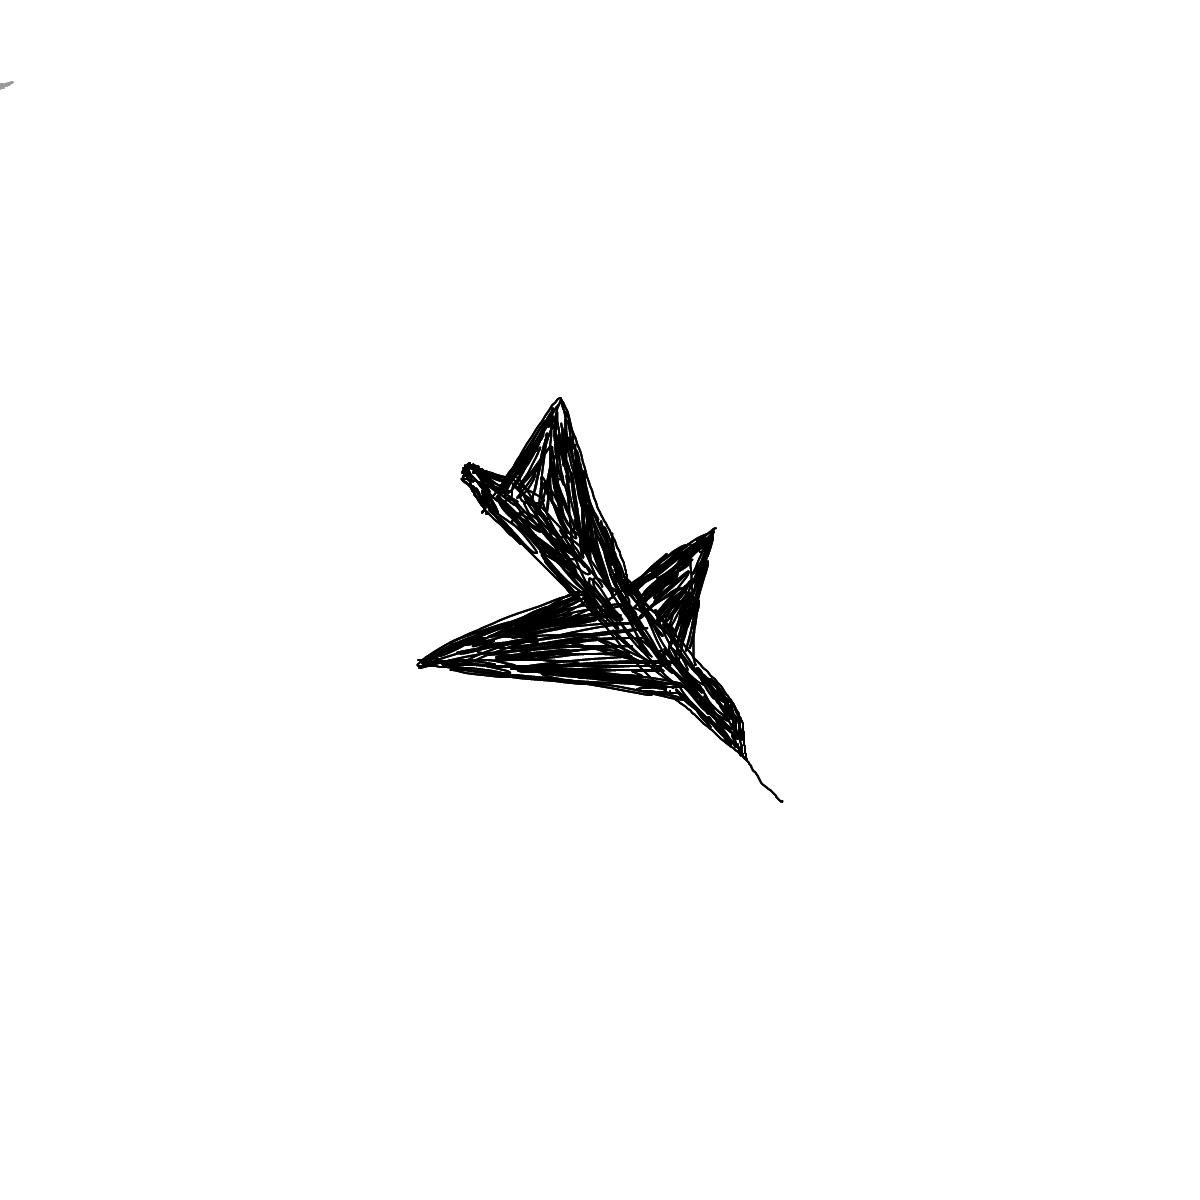 BAAAM drawing#24 lat:52.4751548767089840lng: 13.4068107604980470